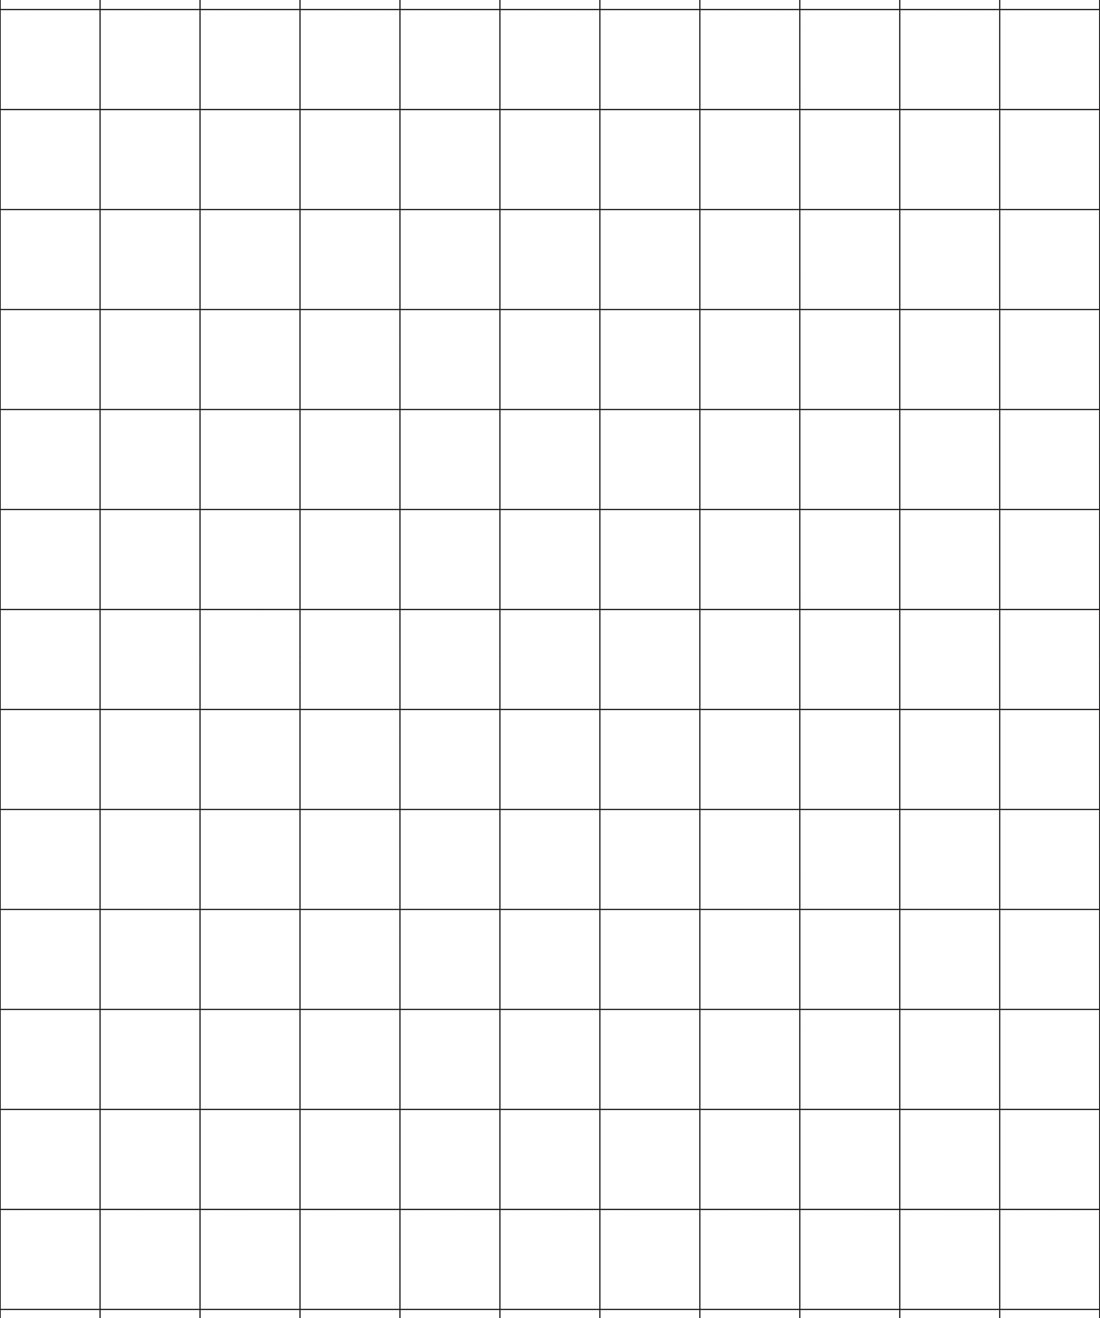 Contact Grid 55 Wallpaper Simple Grid Pattern Milton King